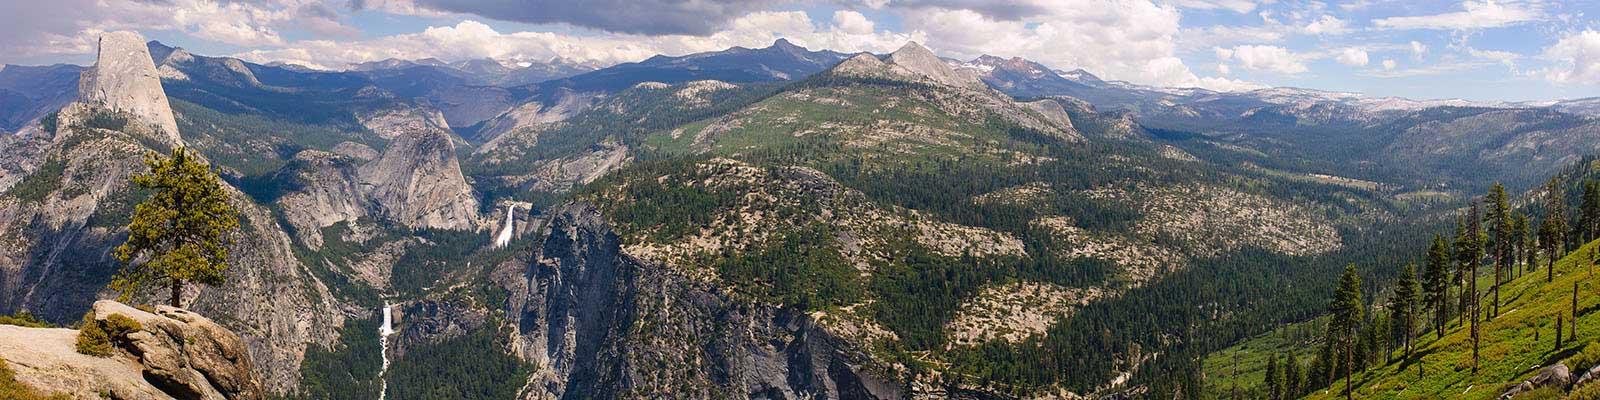 Yosemite Day Hike Tours, Yosemite Hiking Guides | Wildland Trekking